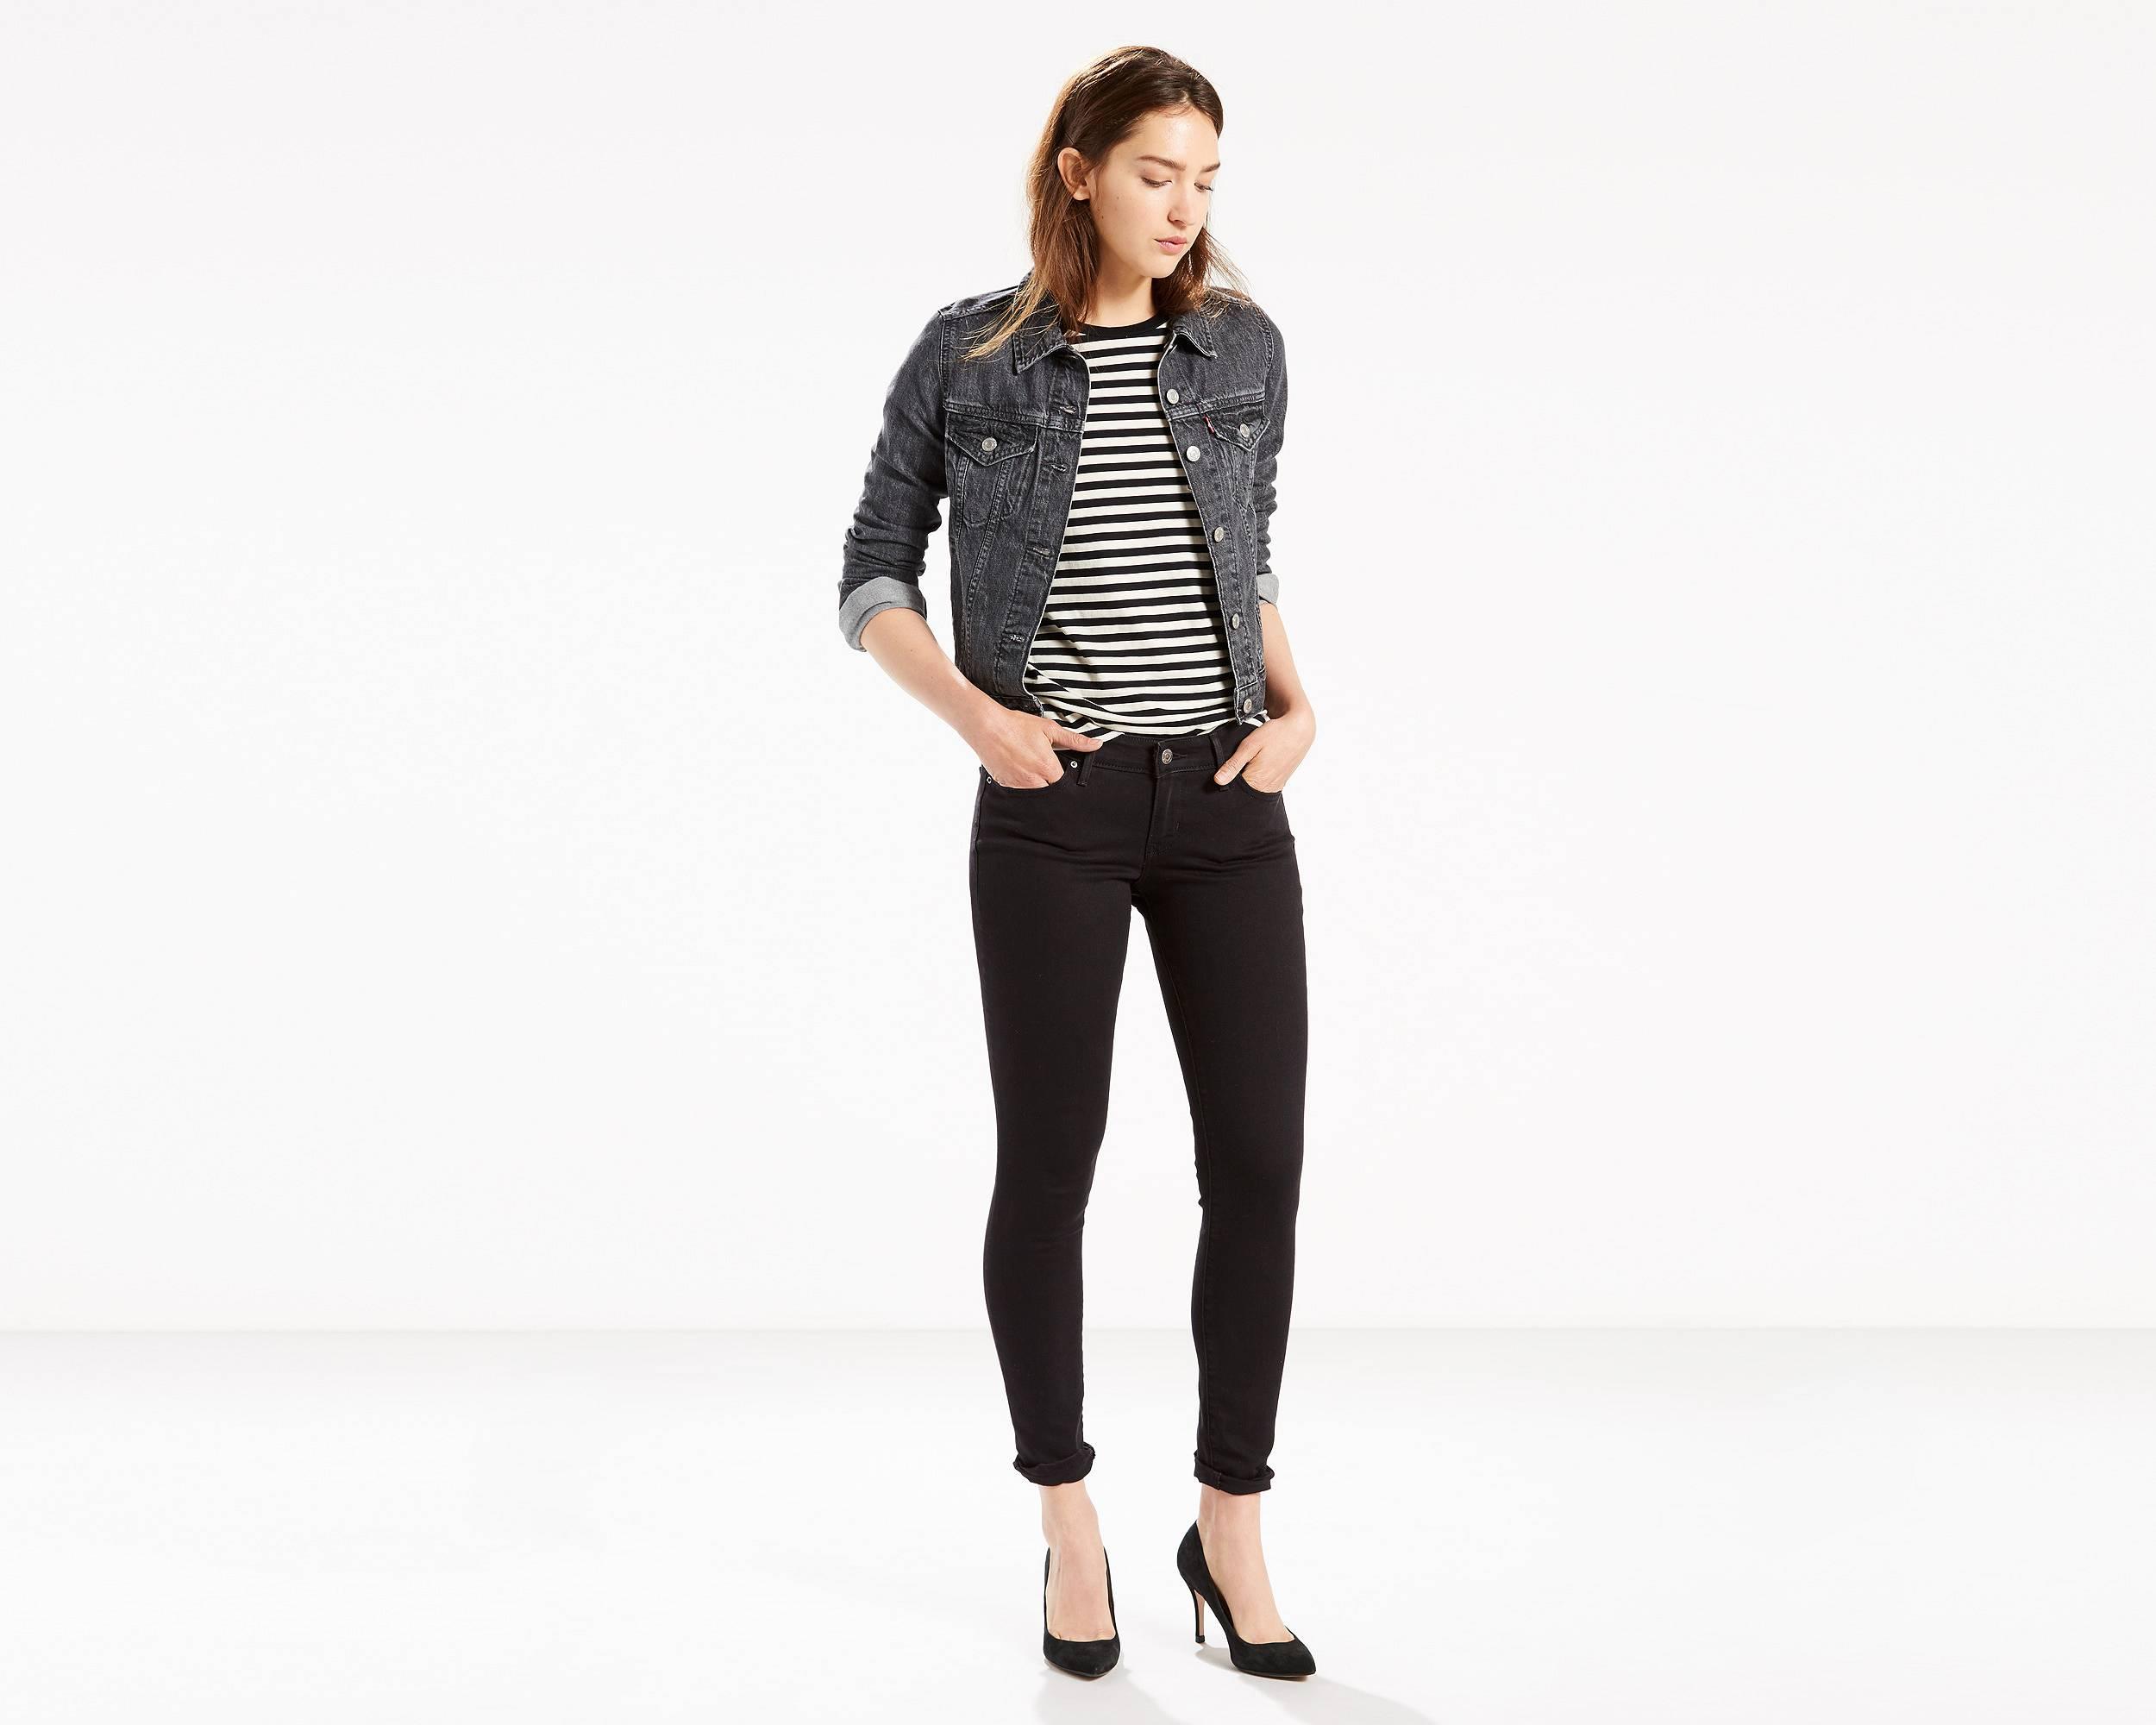 811 Curvy Skinny Jeans | Soft Black |Levi's® United States (US)